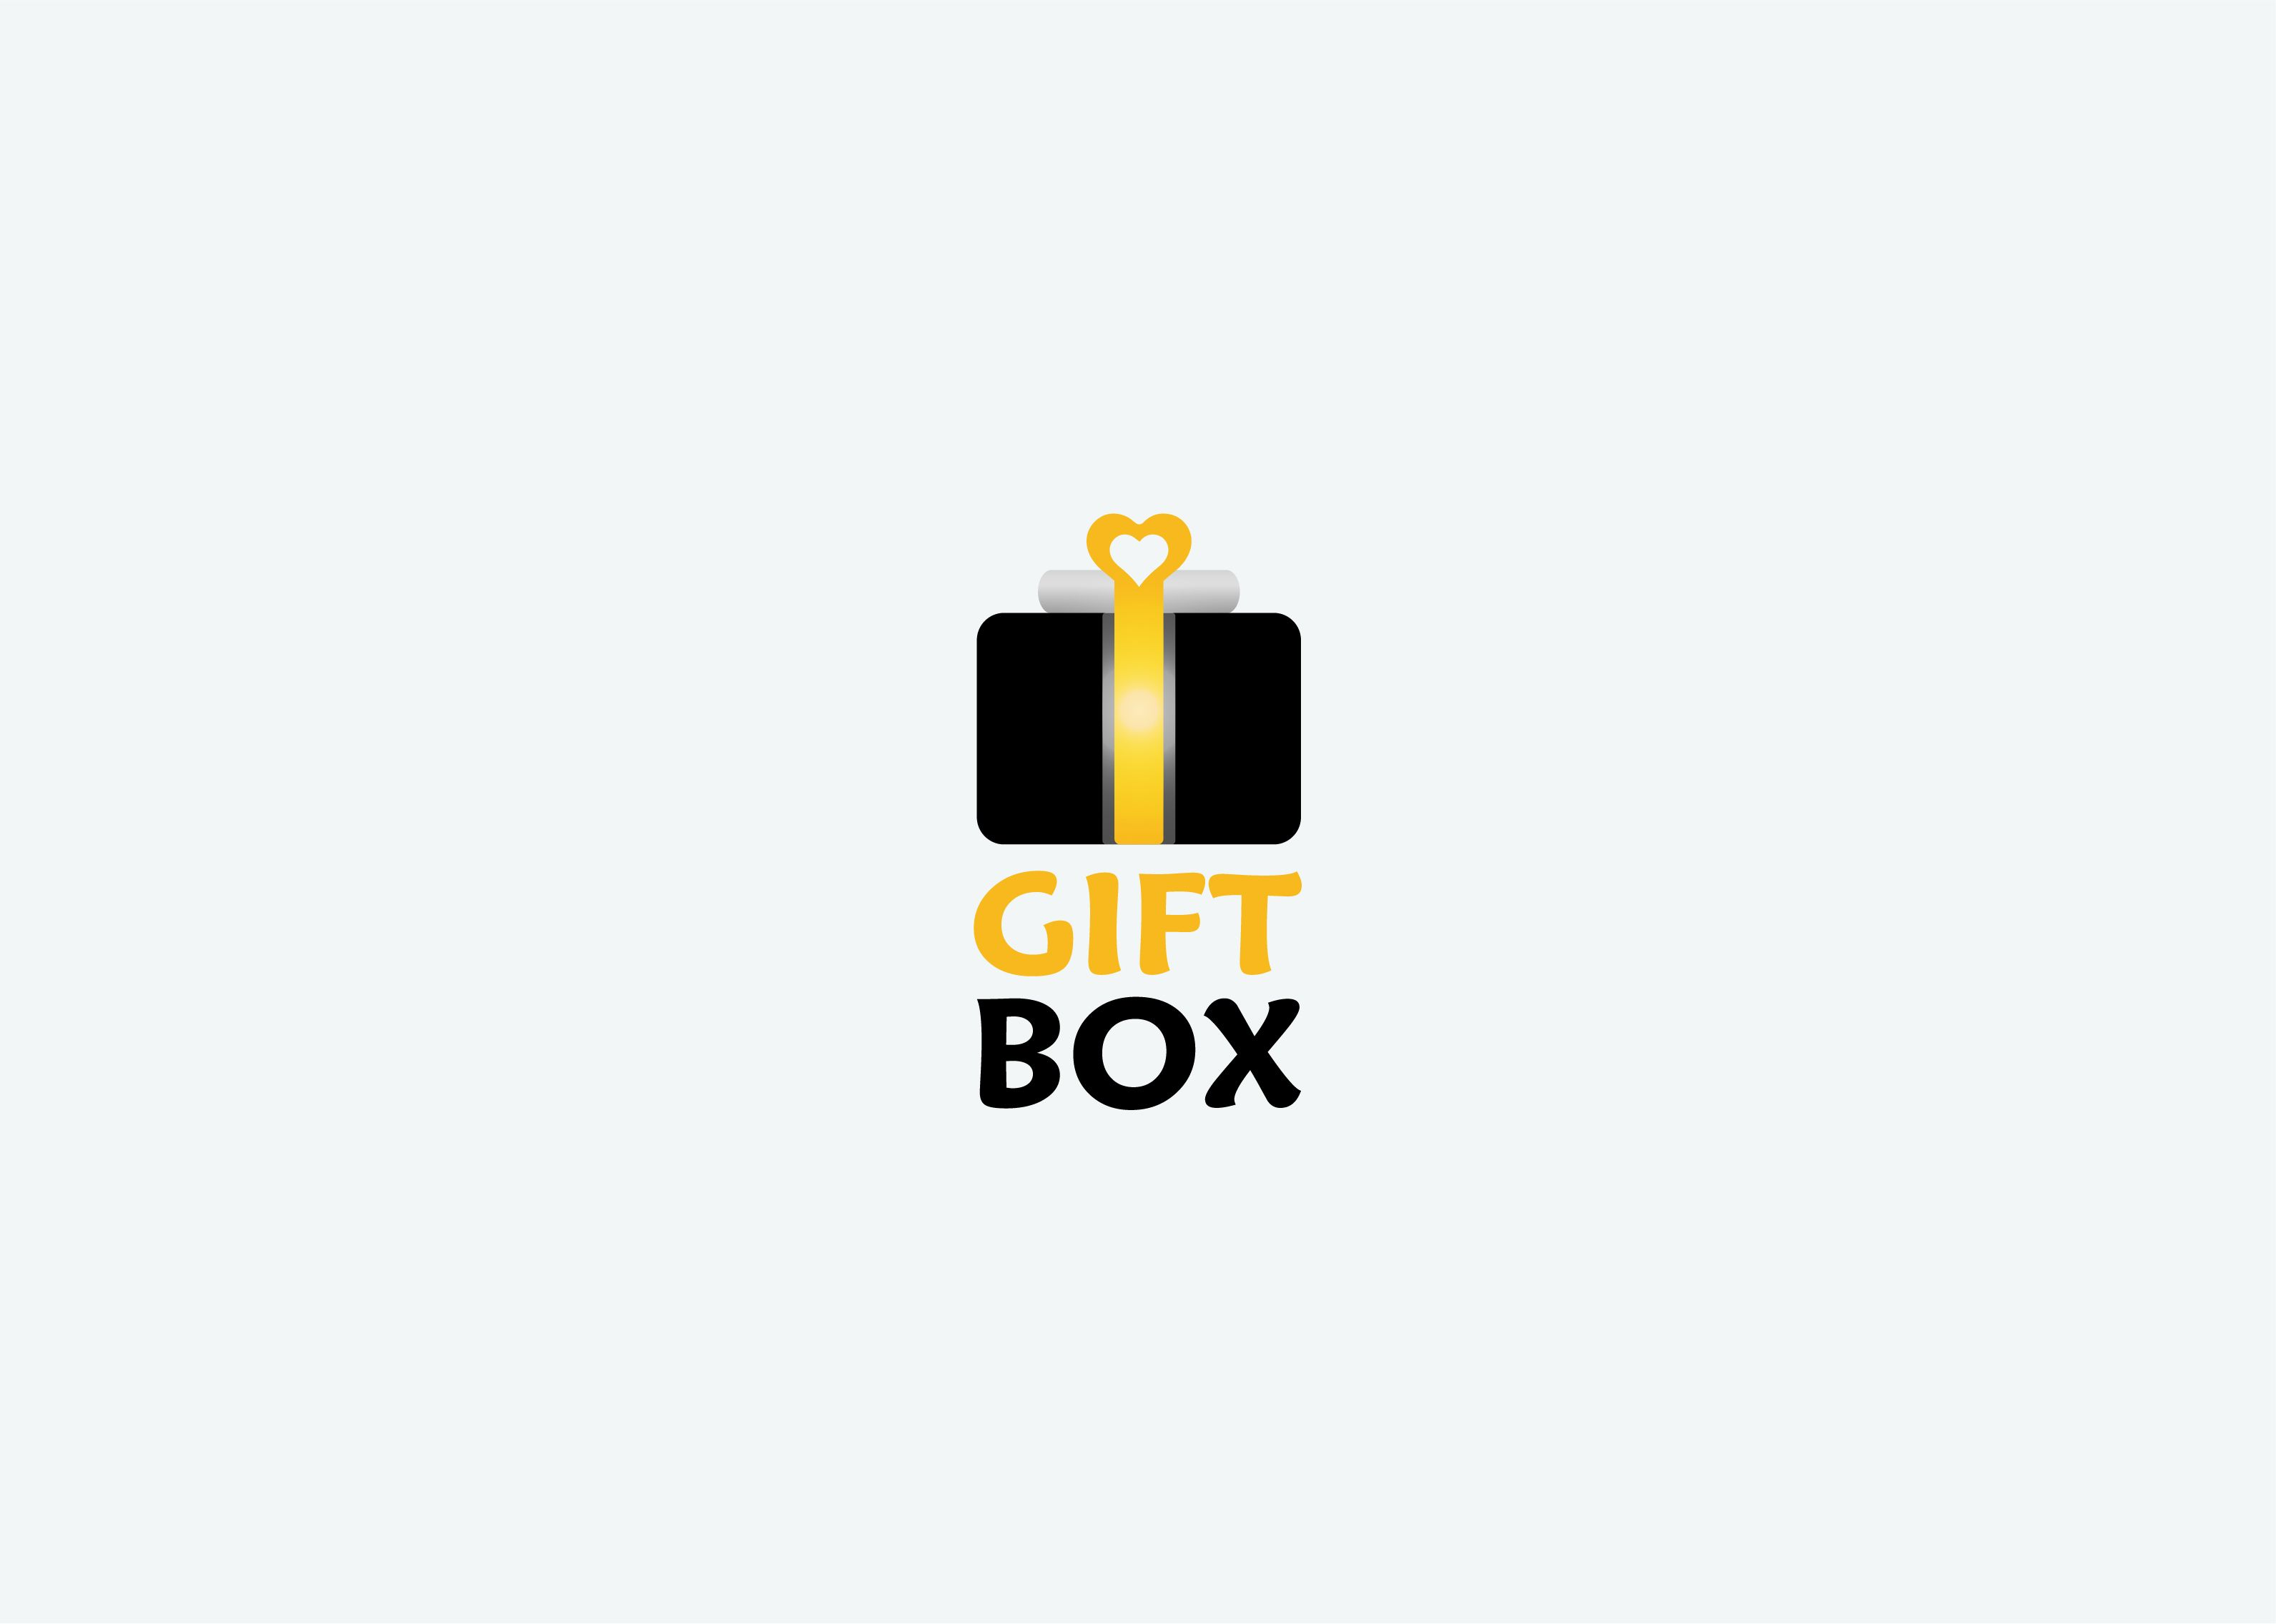 Gift Box Logo Design For Hajj Gifts In 2020 Logo Design Logos Shop Logo